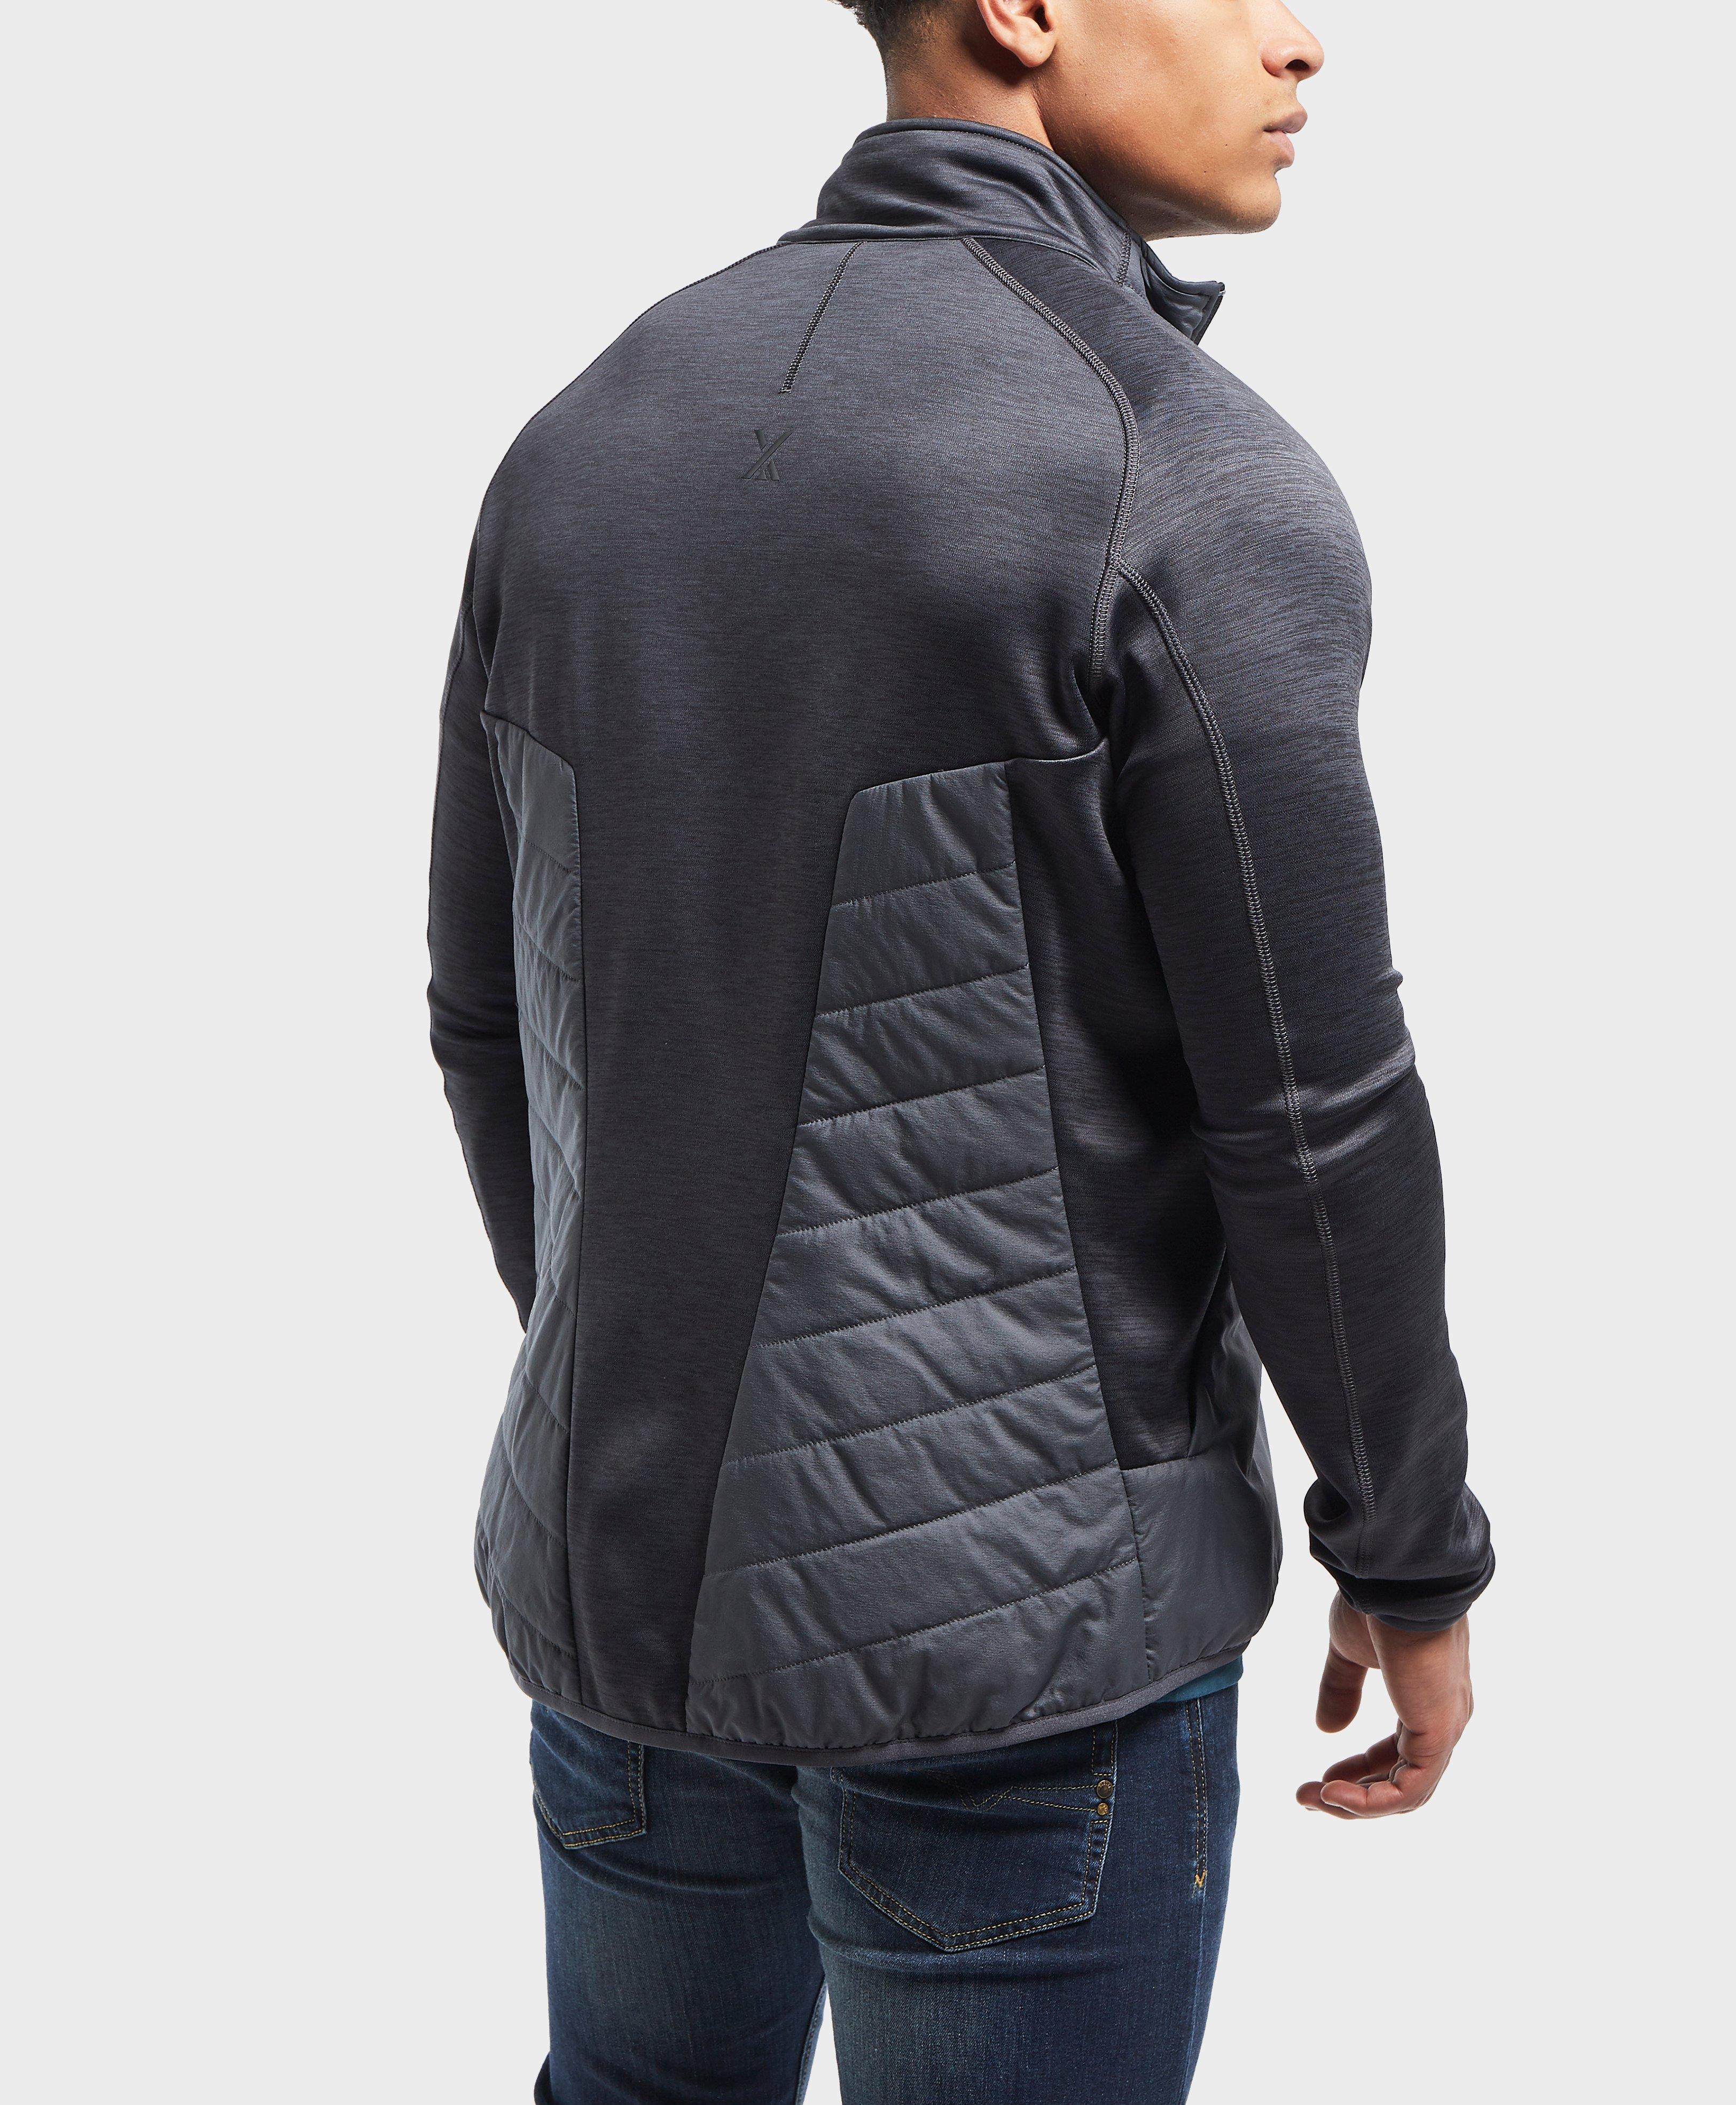 soft and light unbeatable price get cheap Berghaus Gemini Hybrid Lightweight Jacket for Men - Lyst